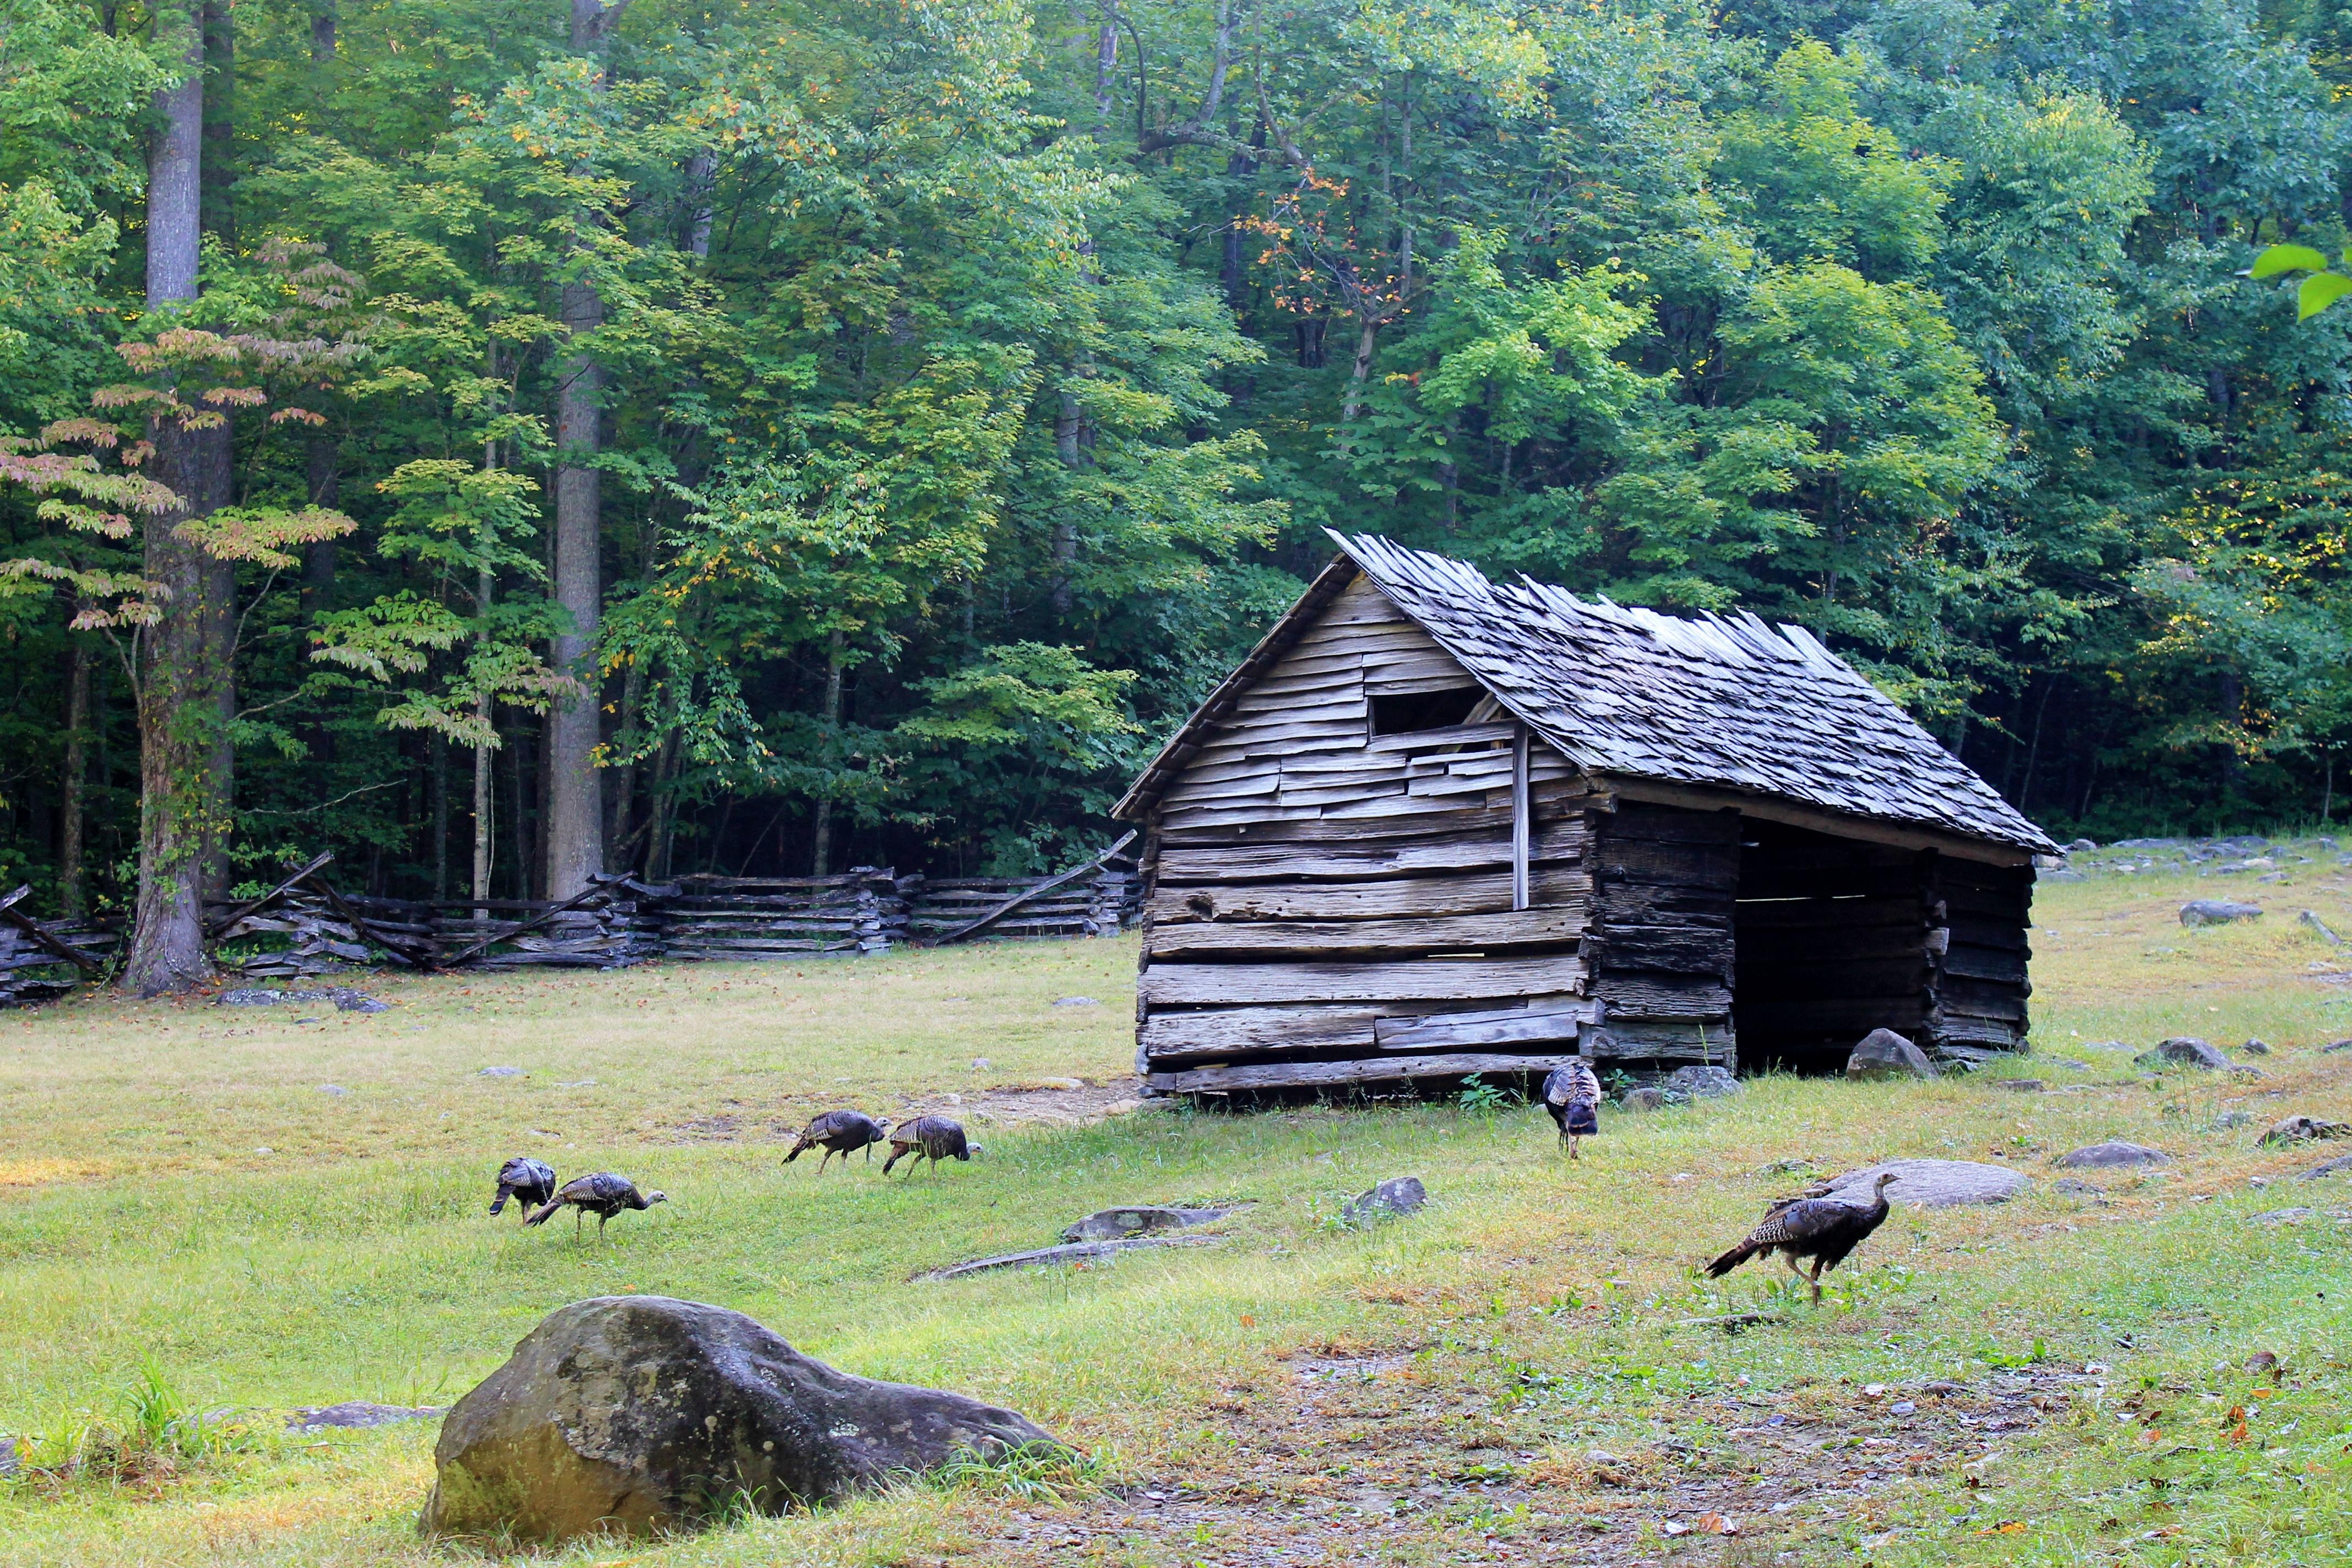 The Appalachian Trot